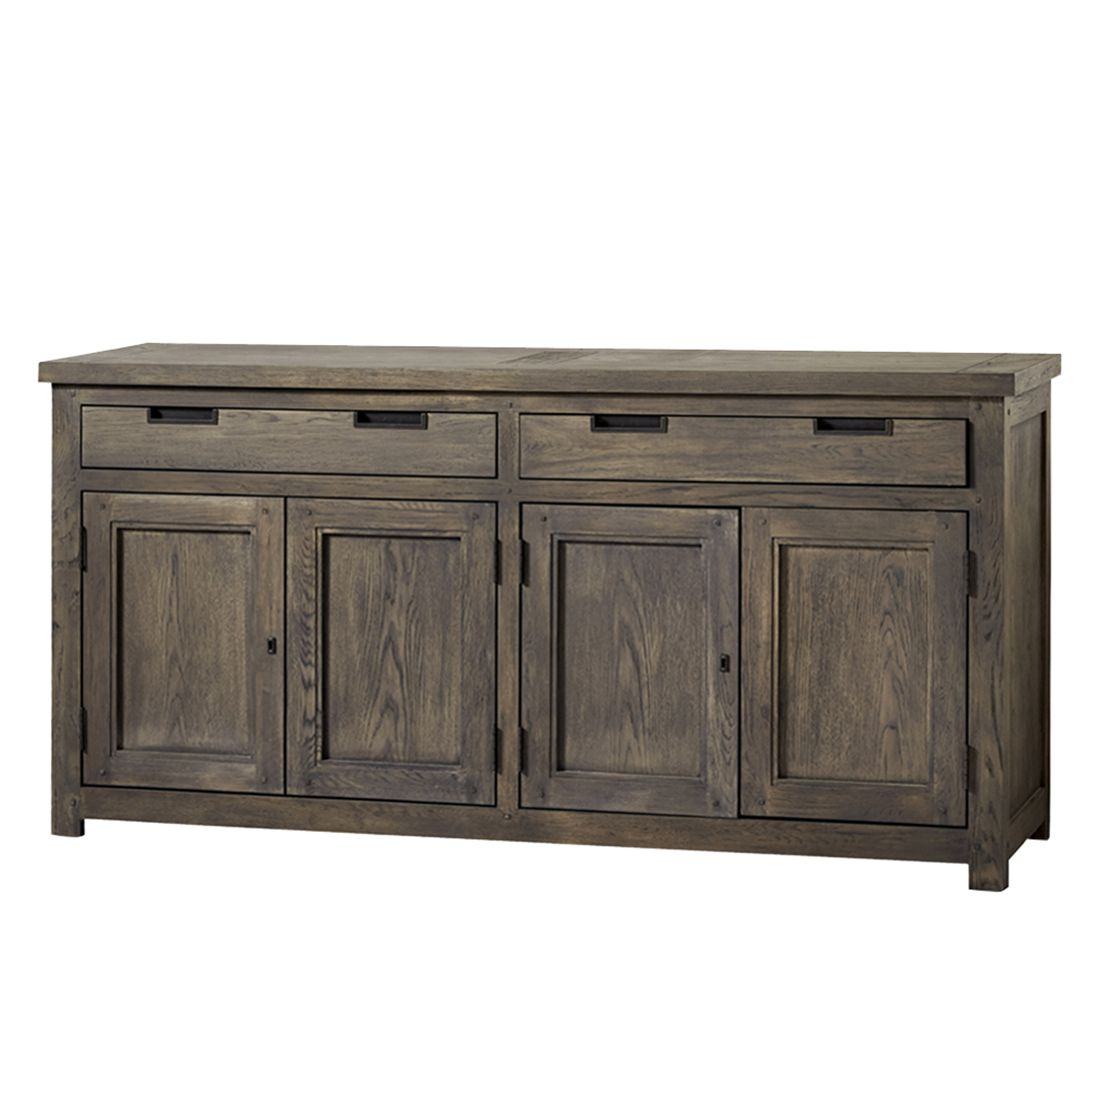 sideboard rauch carprola for. Black Bedroom Furniture Sets. Home Design Ideas